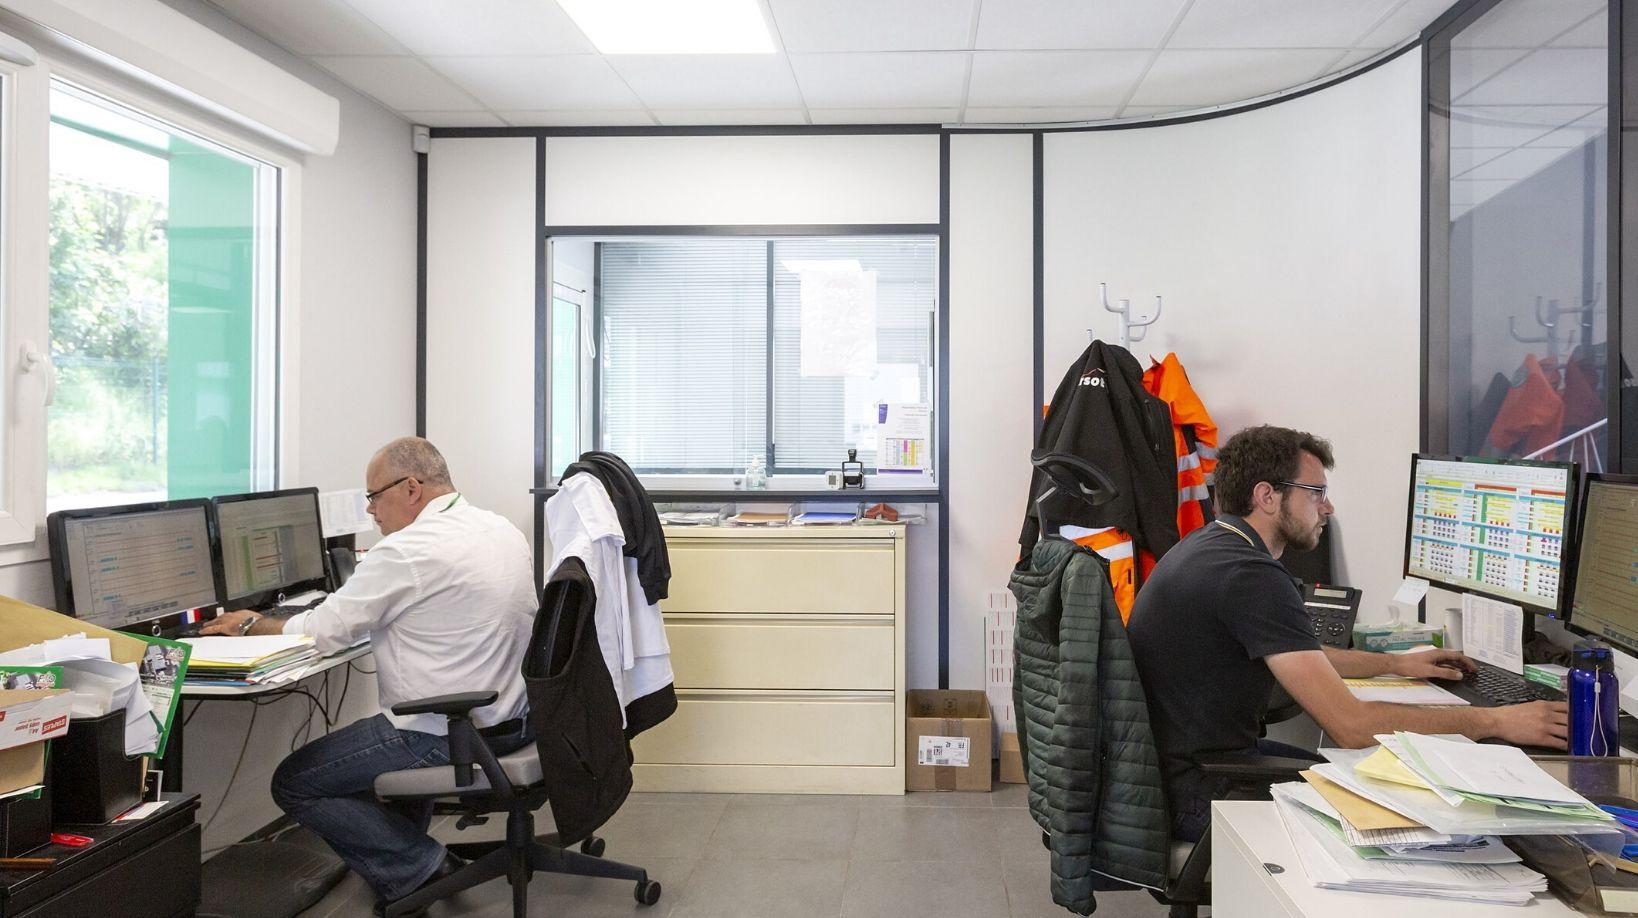 Sogranlotrans service expertise prestation reguliere v3